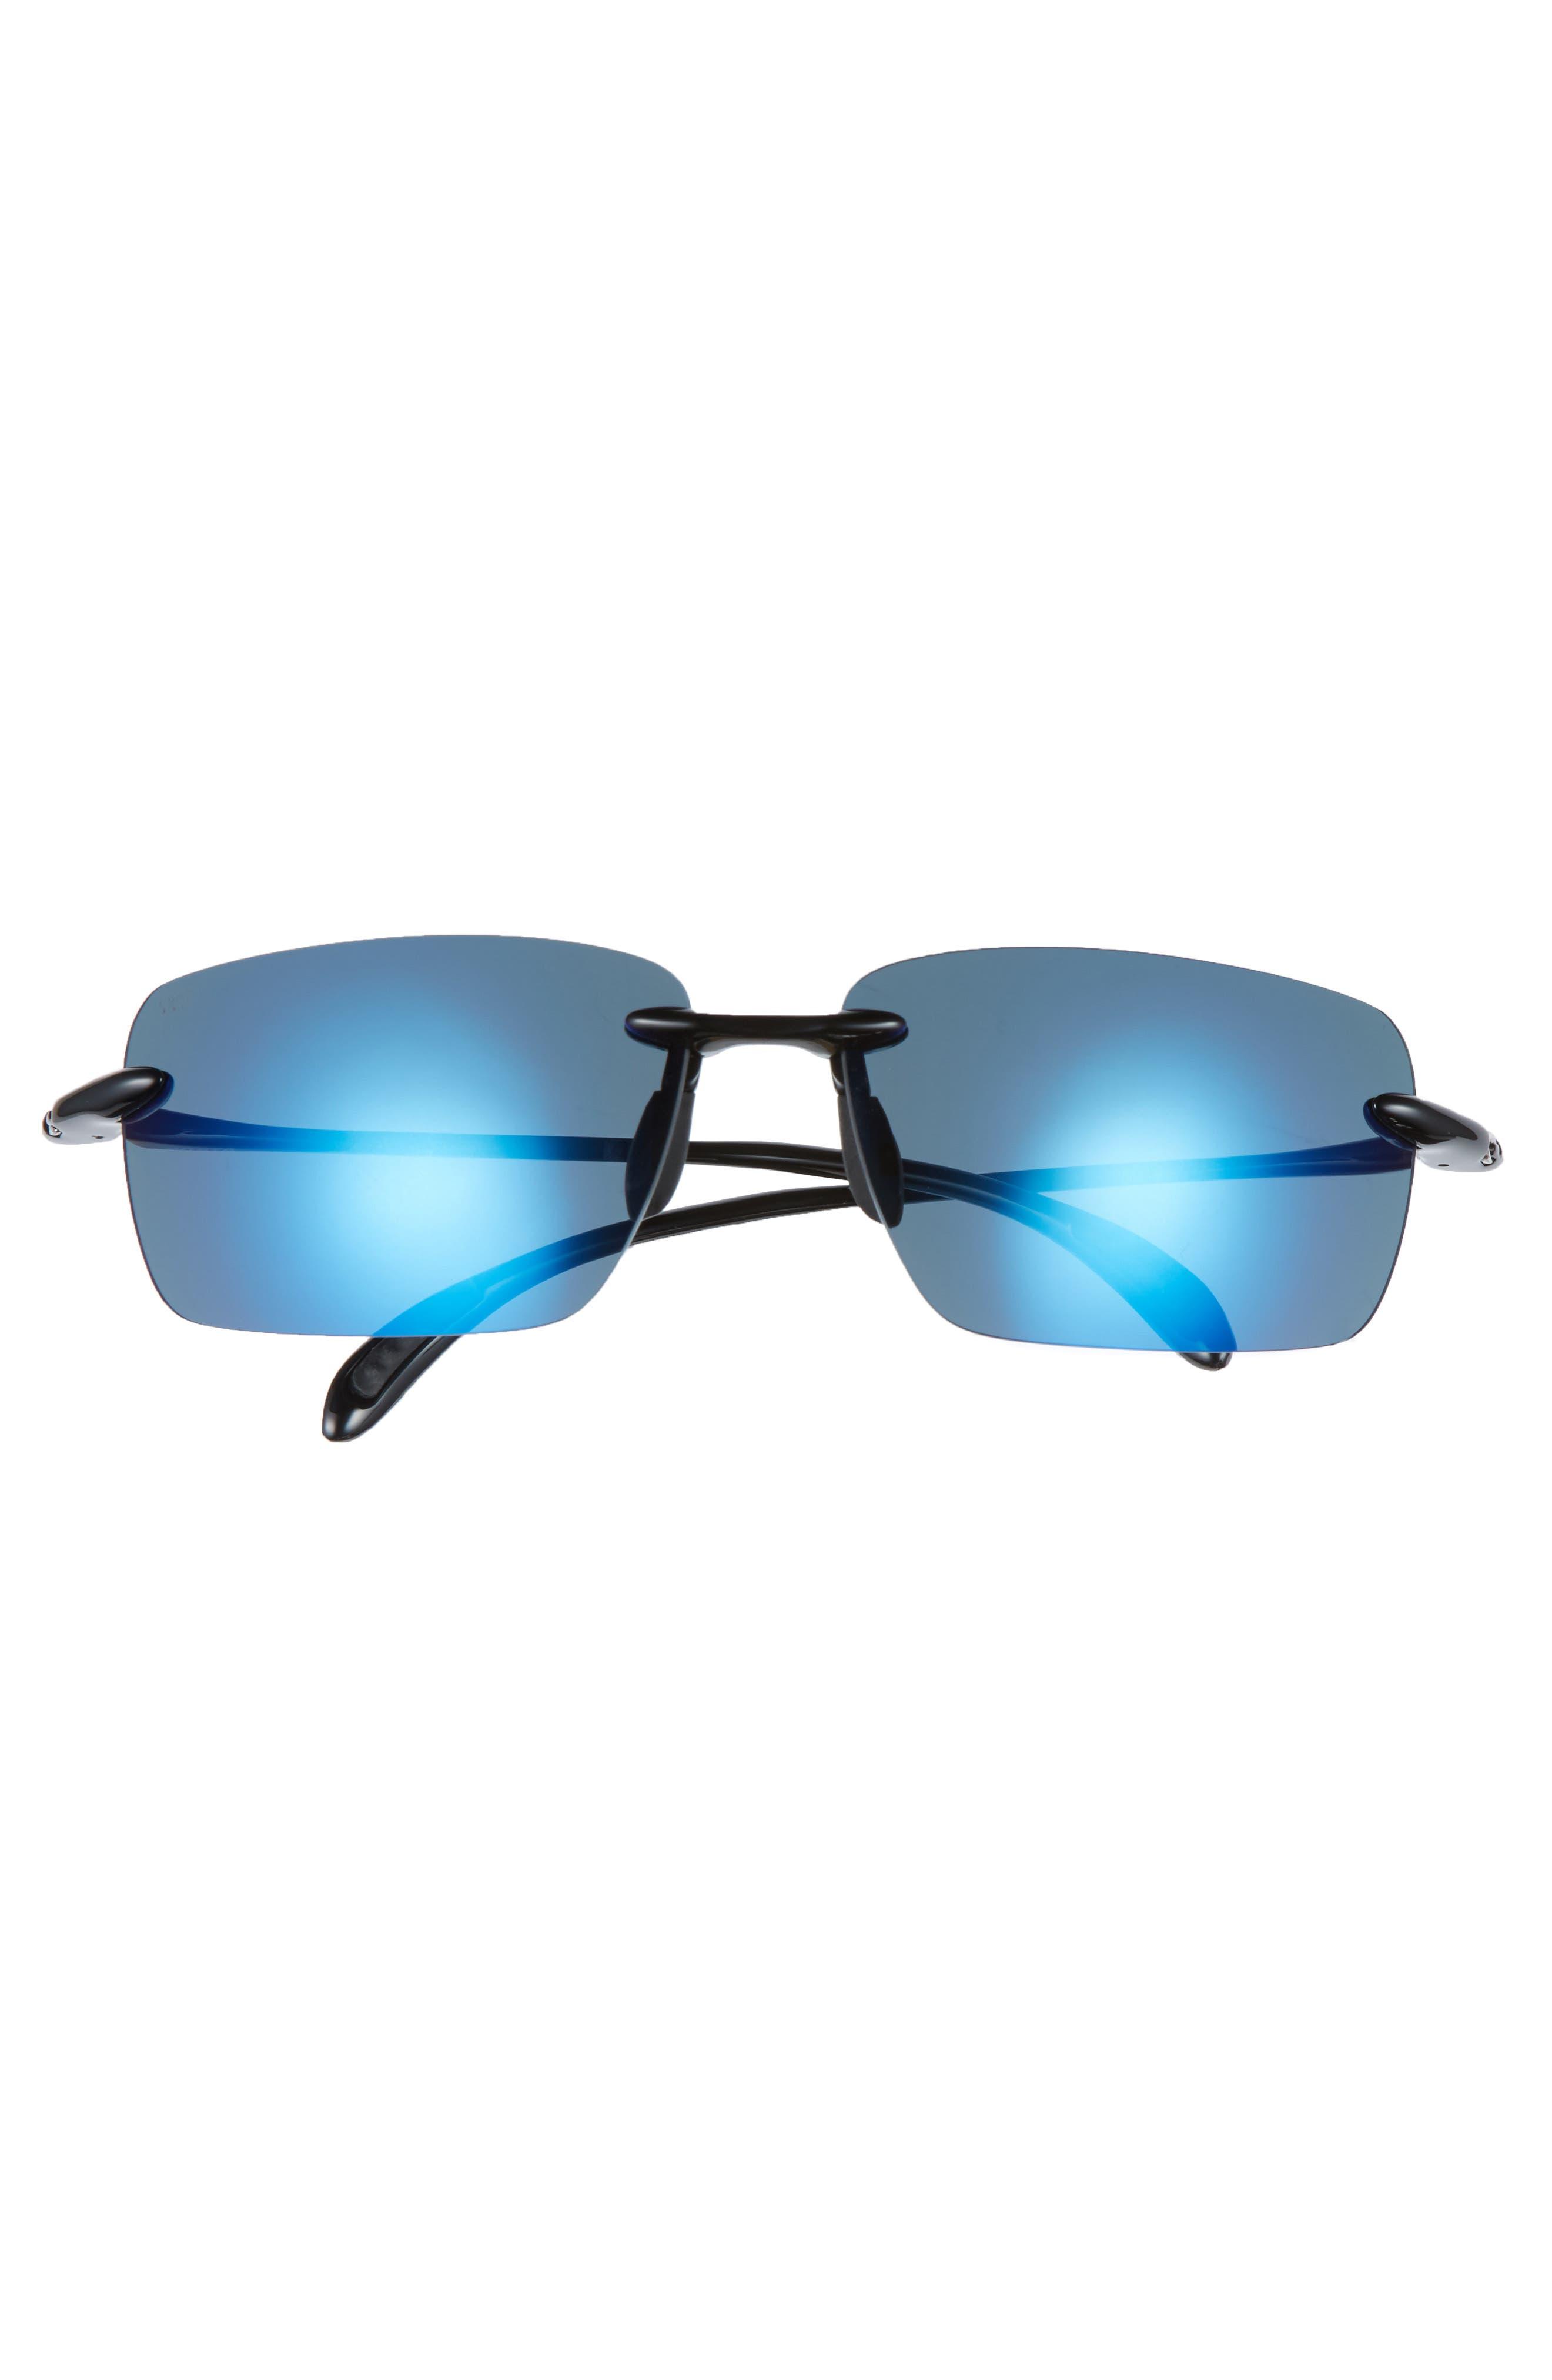 Gulfshore XL 66mm Polarized Sunglasses,                             Alternate thumbnail 2, color,                             BLACK/ BLUE MIRROR